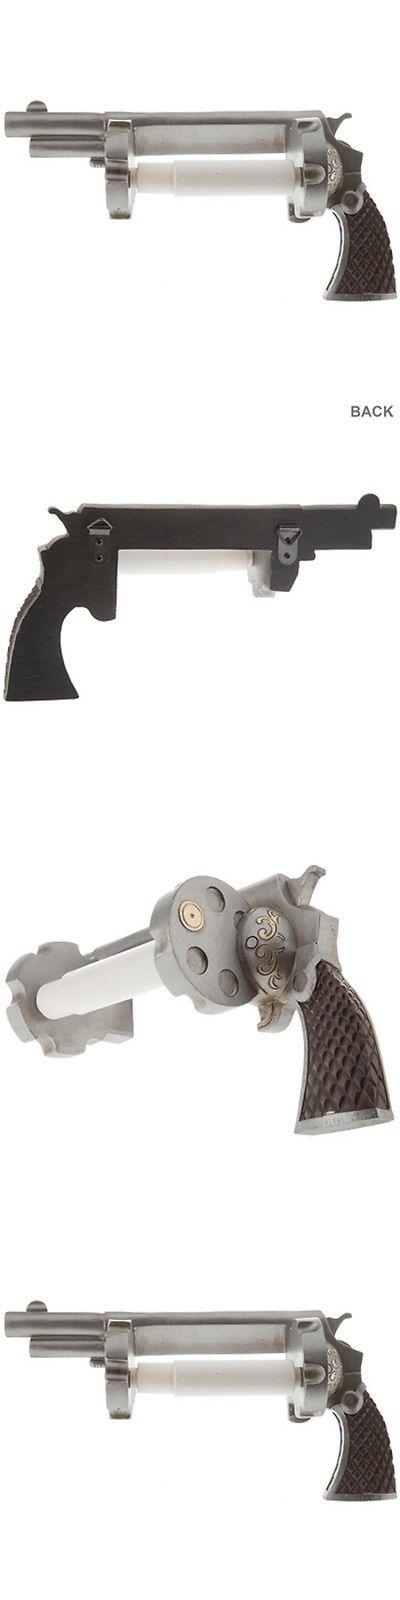 Advertisements 71132: Revolver Pistol Toilet Paper Holder Cowboy Ammo Gun Man Cave Bathroom Decor Part BUY IT NOW ONLY: $32.99